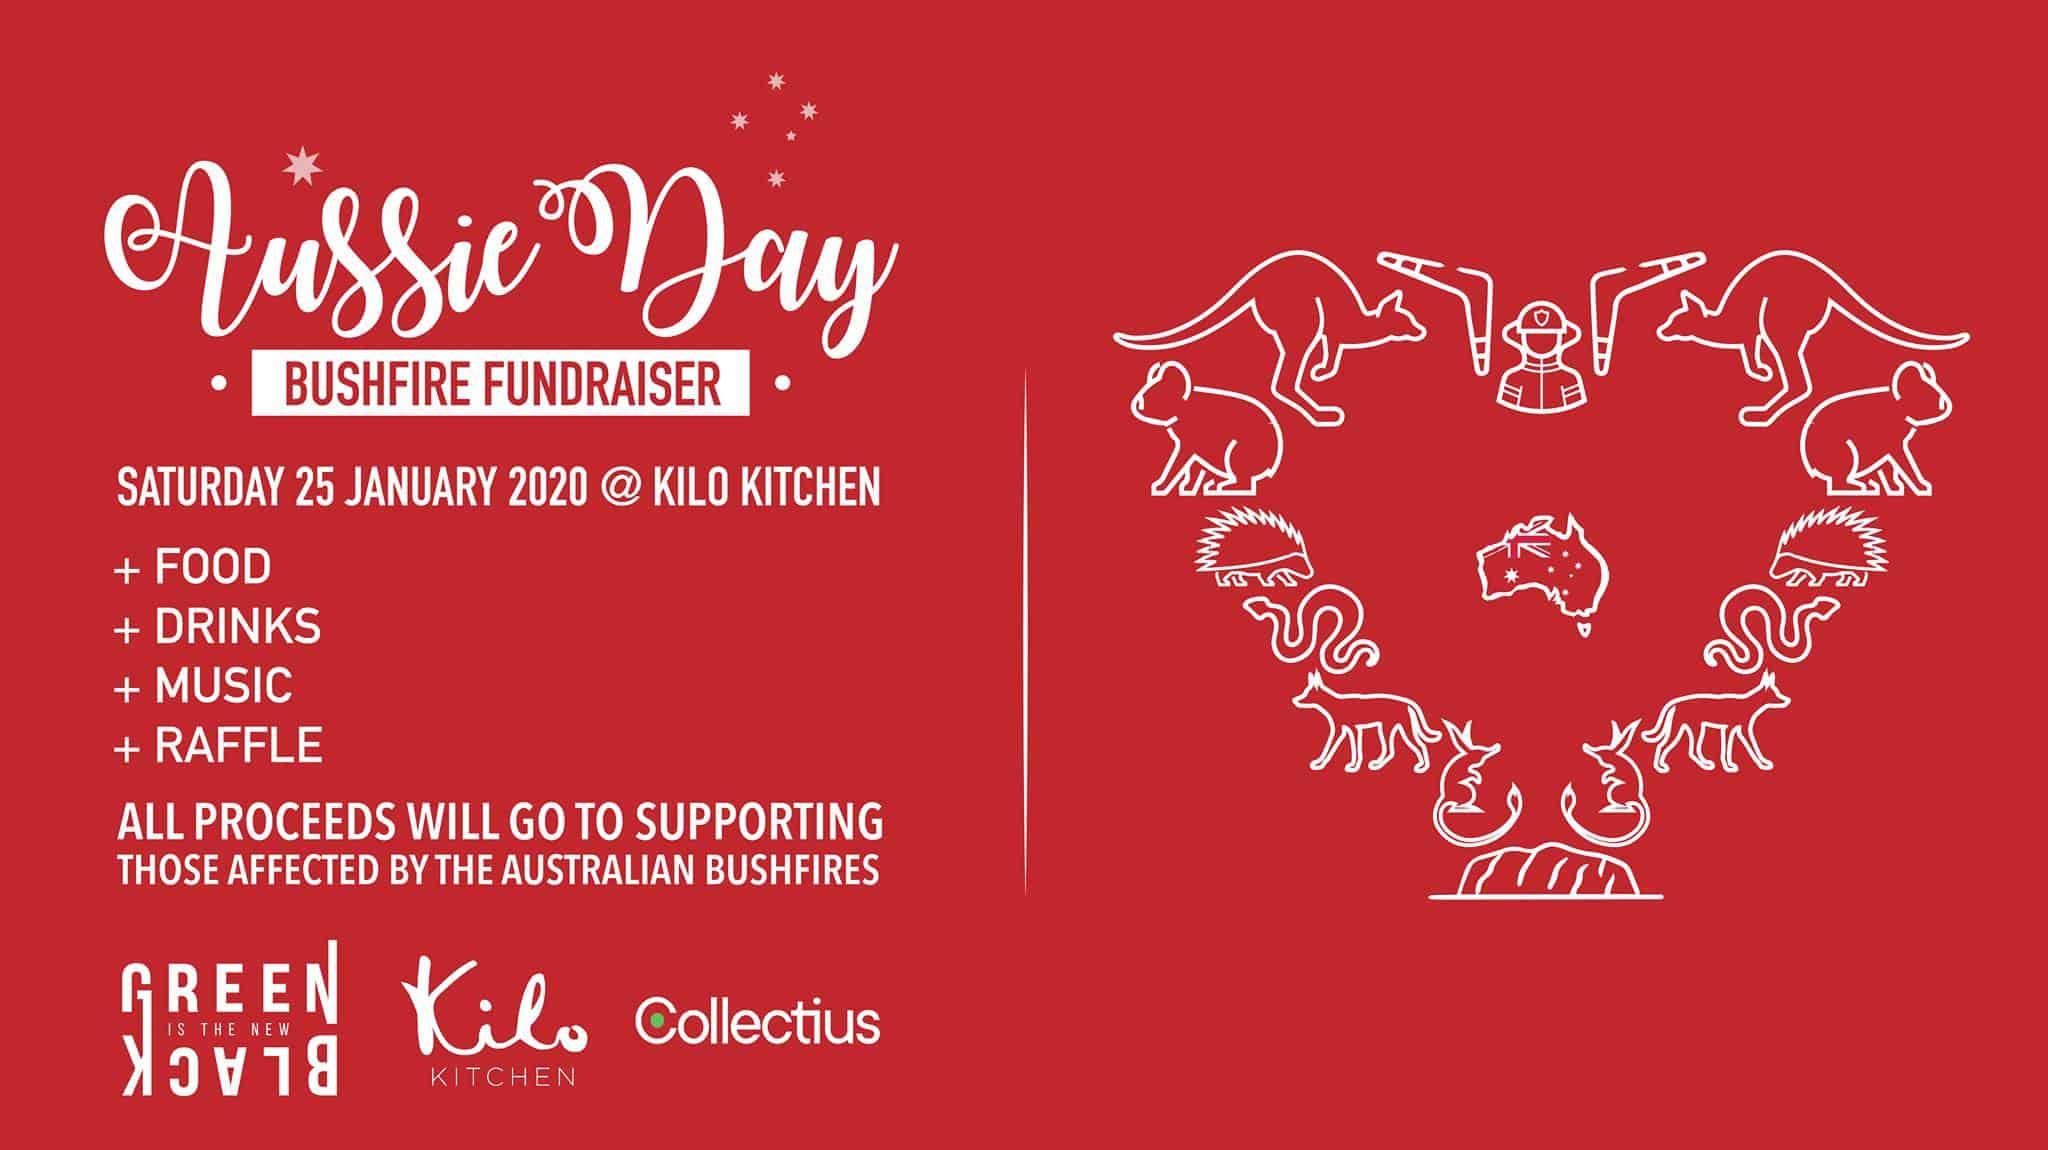 Australia bushfire fundraiser event